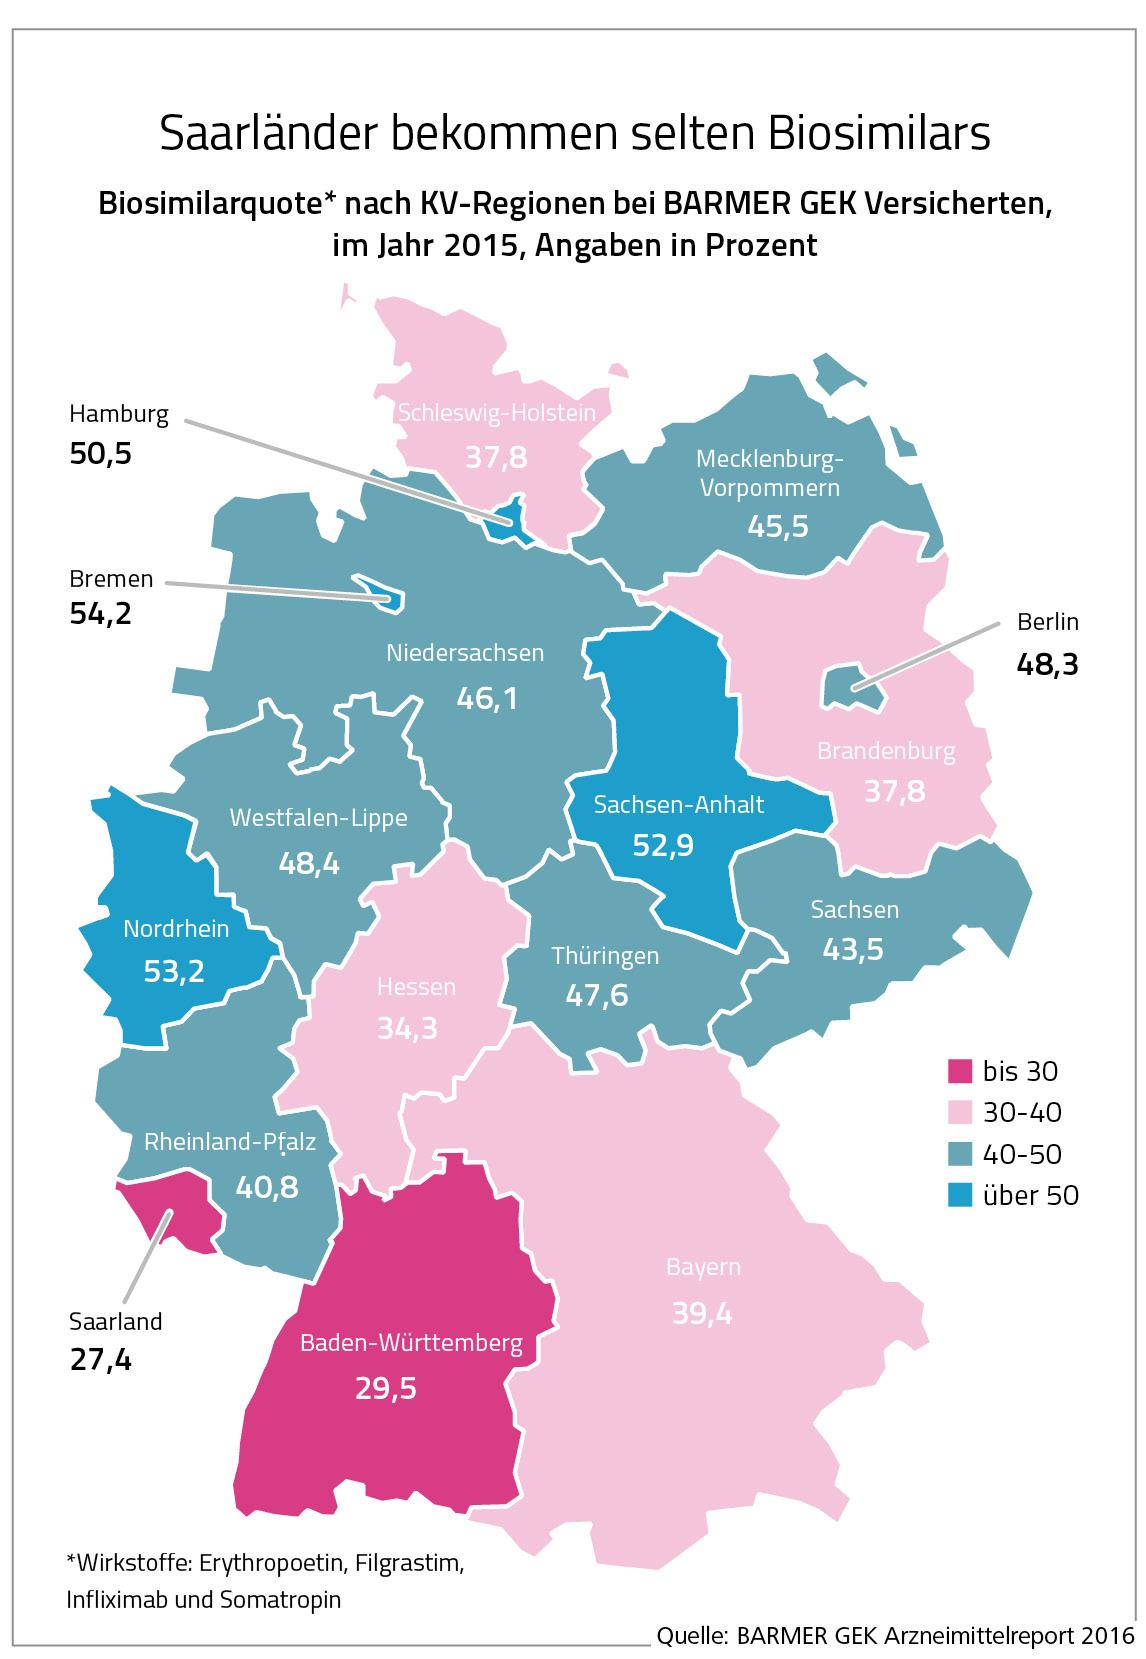 b-Infografik-2-Arzneimittelreport-2016